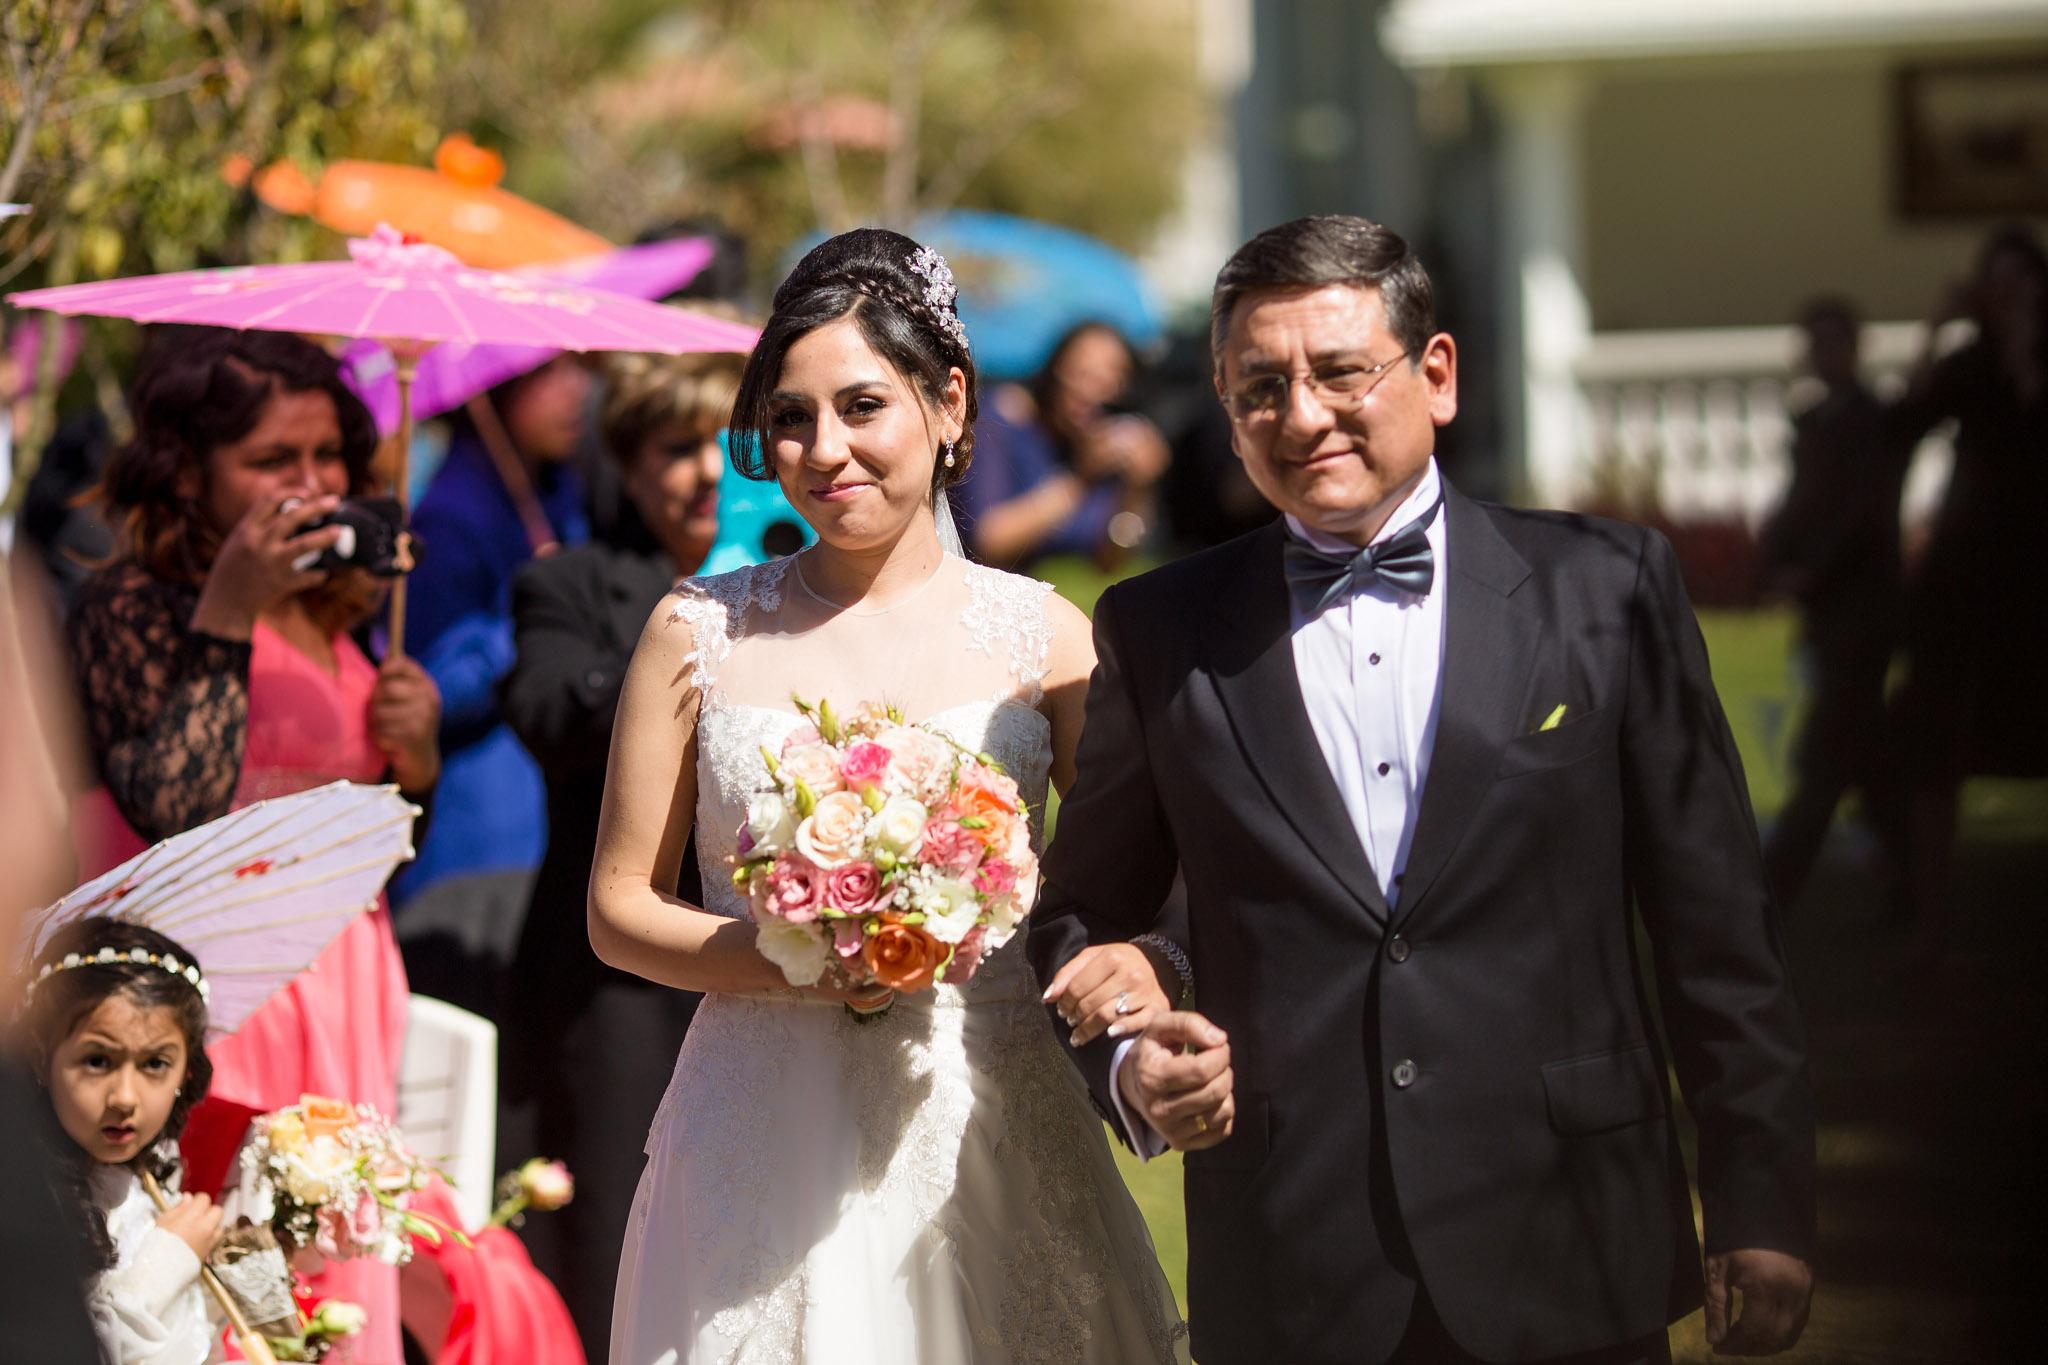 Wedding_Travellers_Destination_Wedding_Bolivia_LaPaz-83.jpg